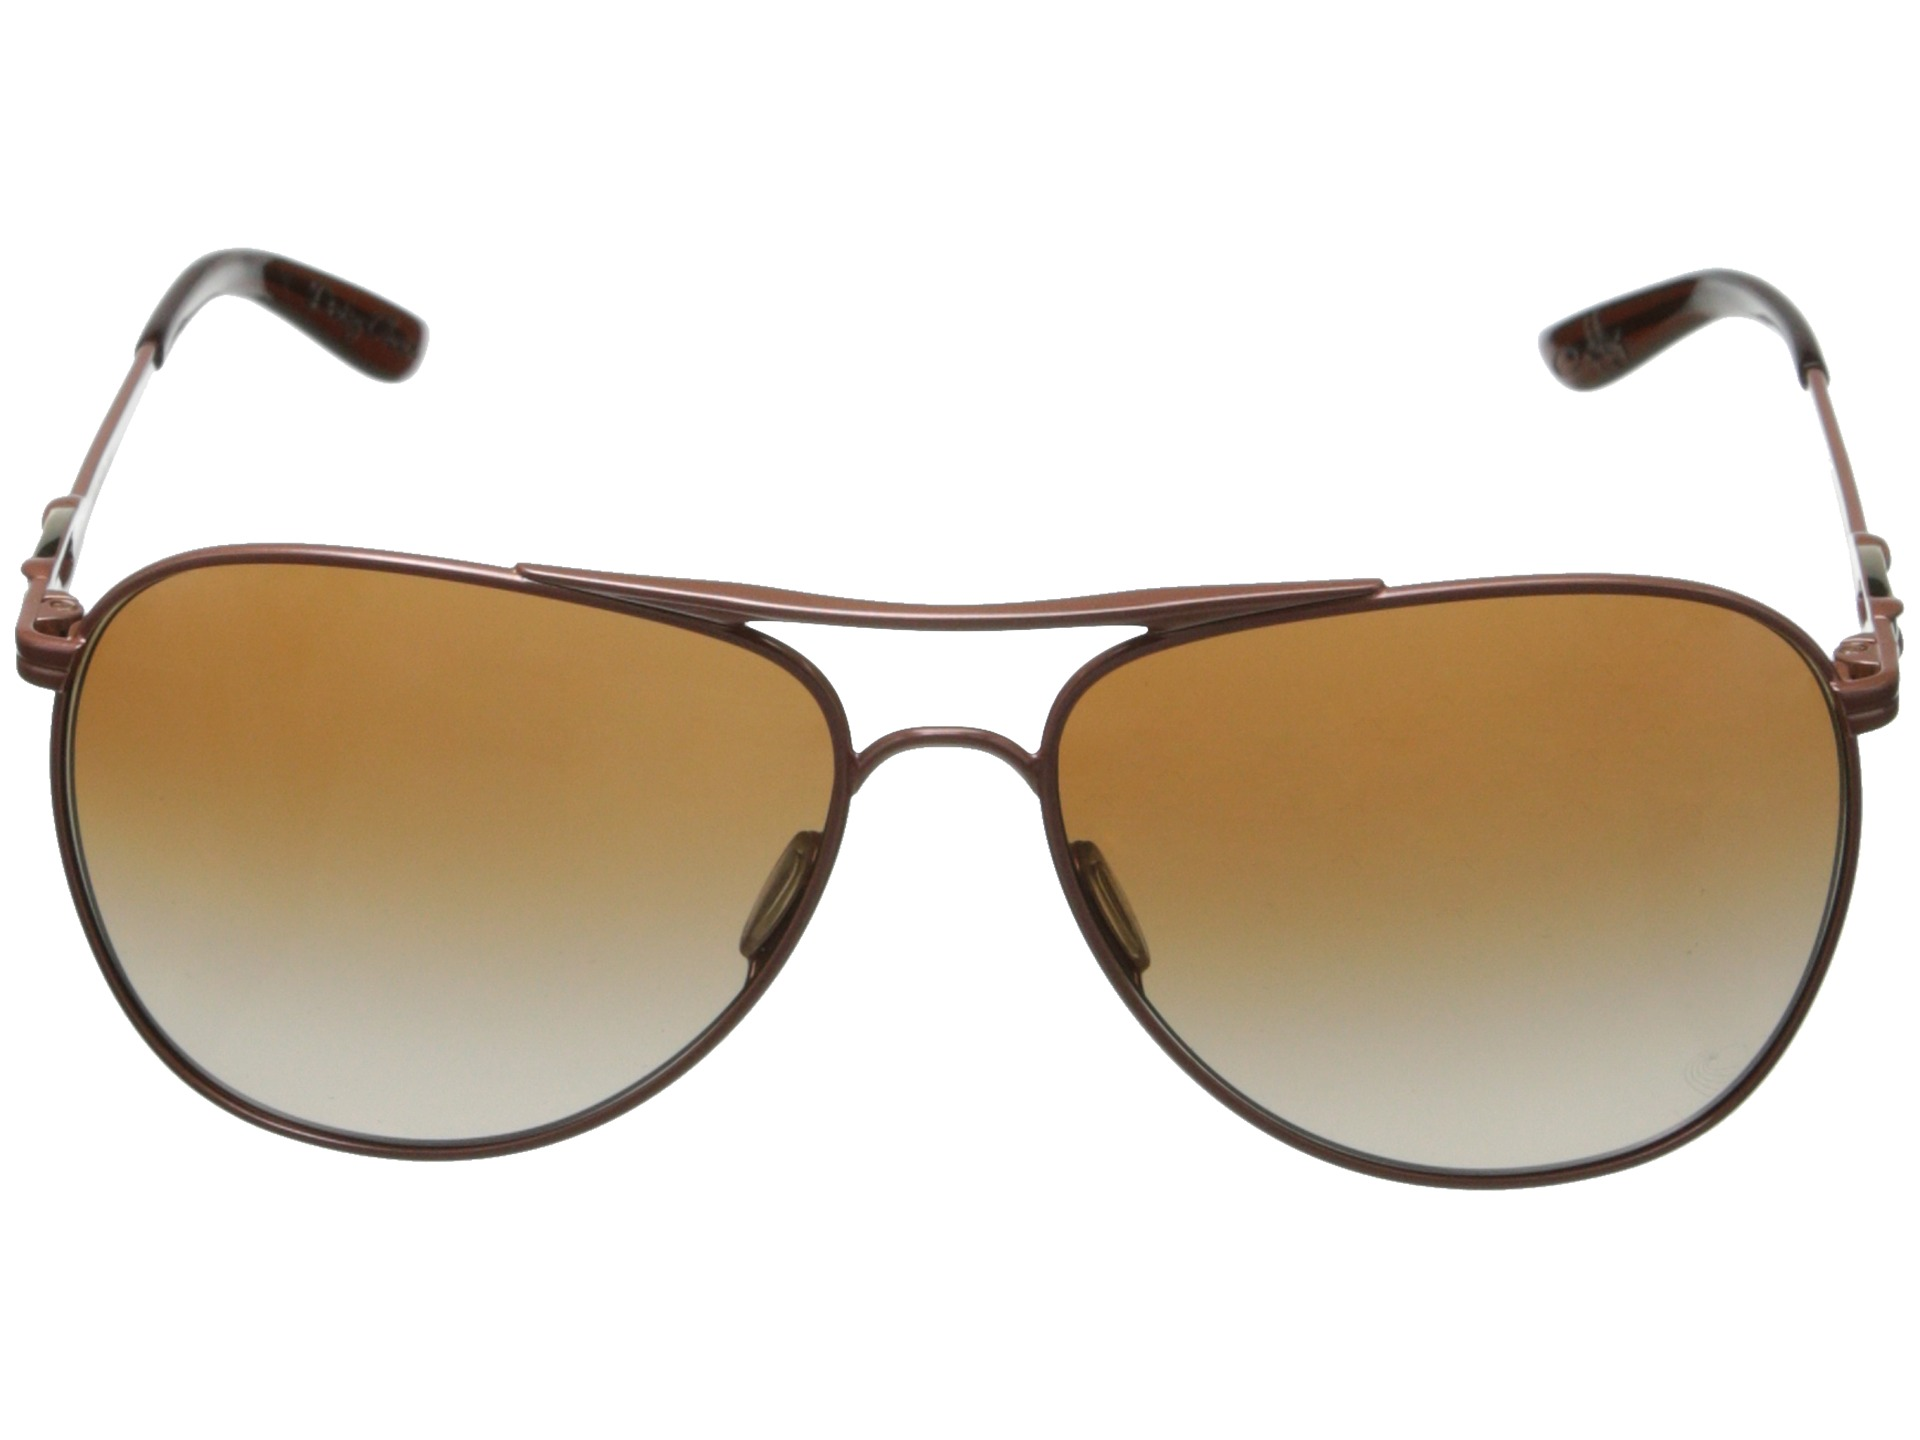 Glasses Frames Lancaster Pa : oakley womens sunglasses daisy chain